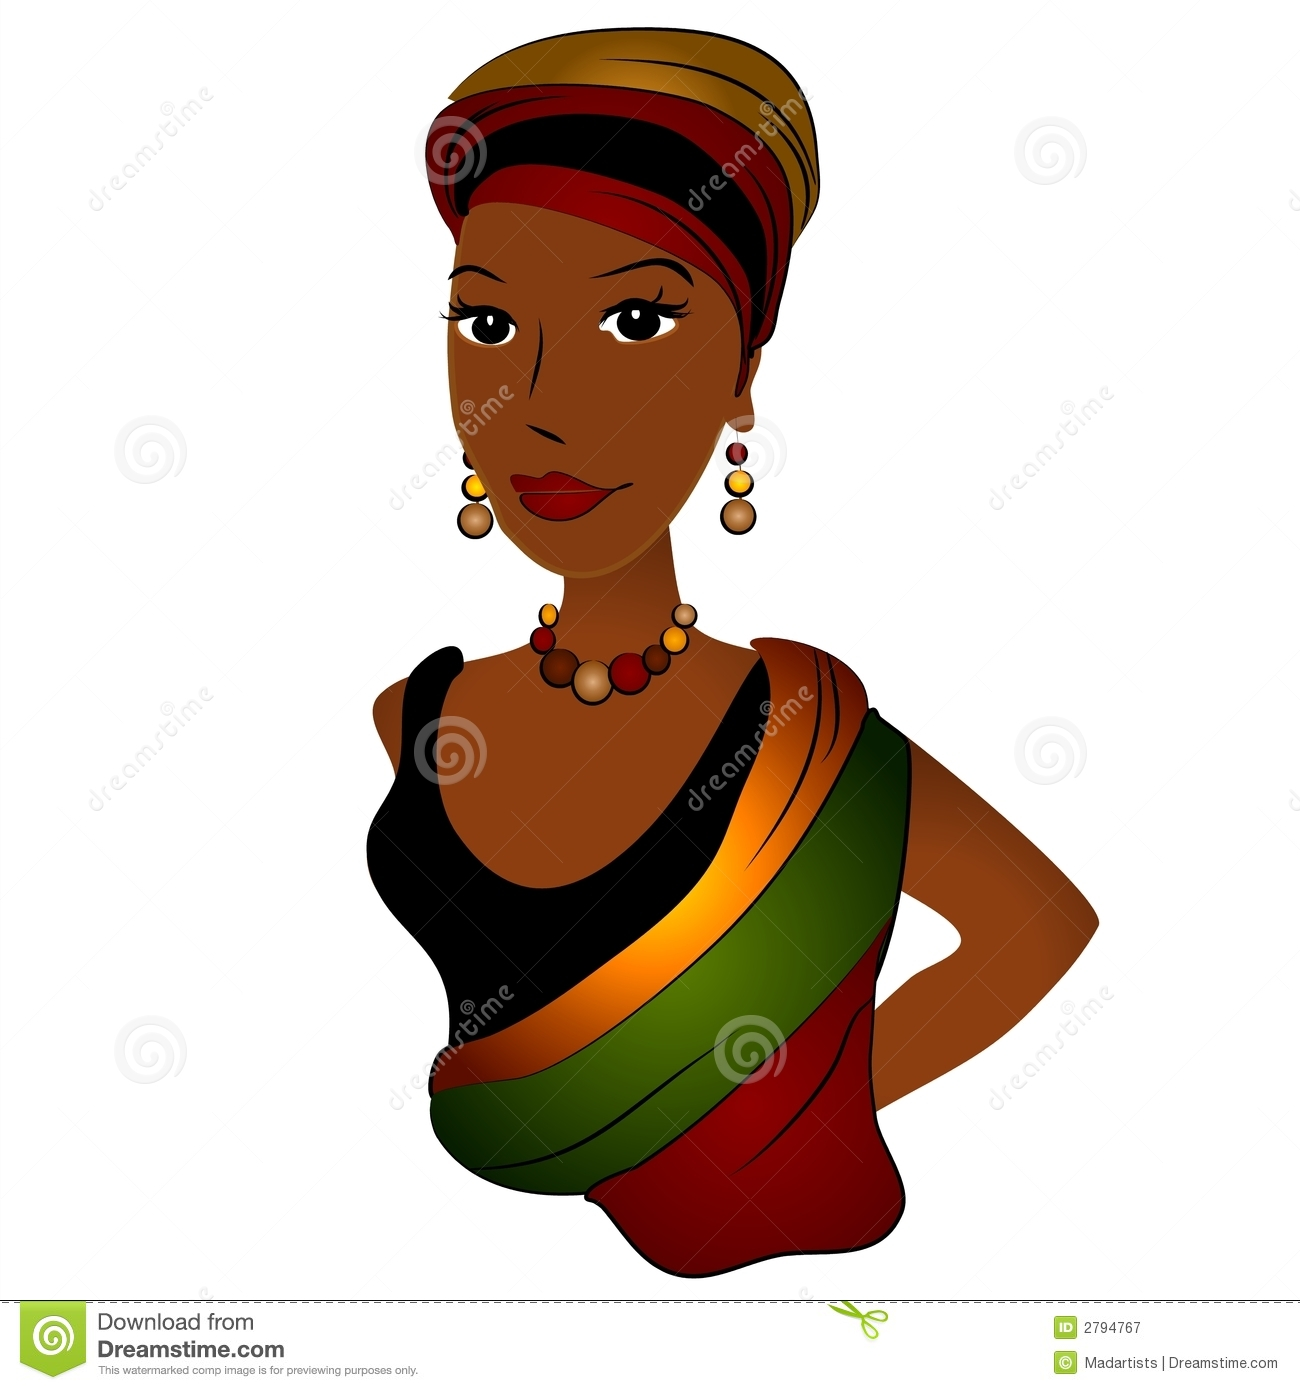 Women cilpart opulent ideas. Businesswoman clipart supe woman